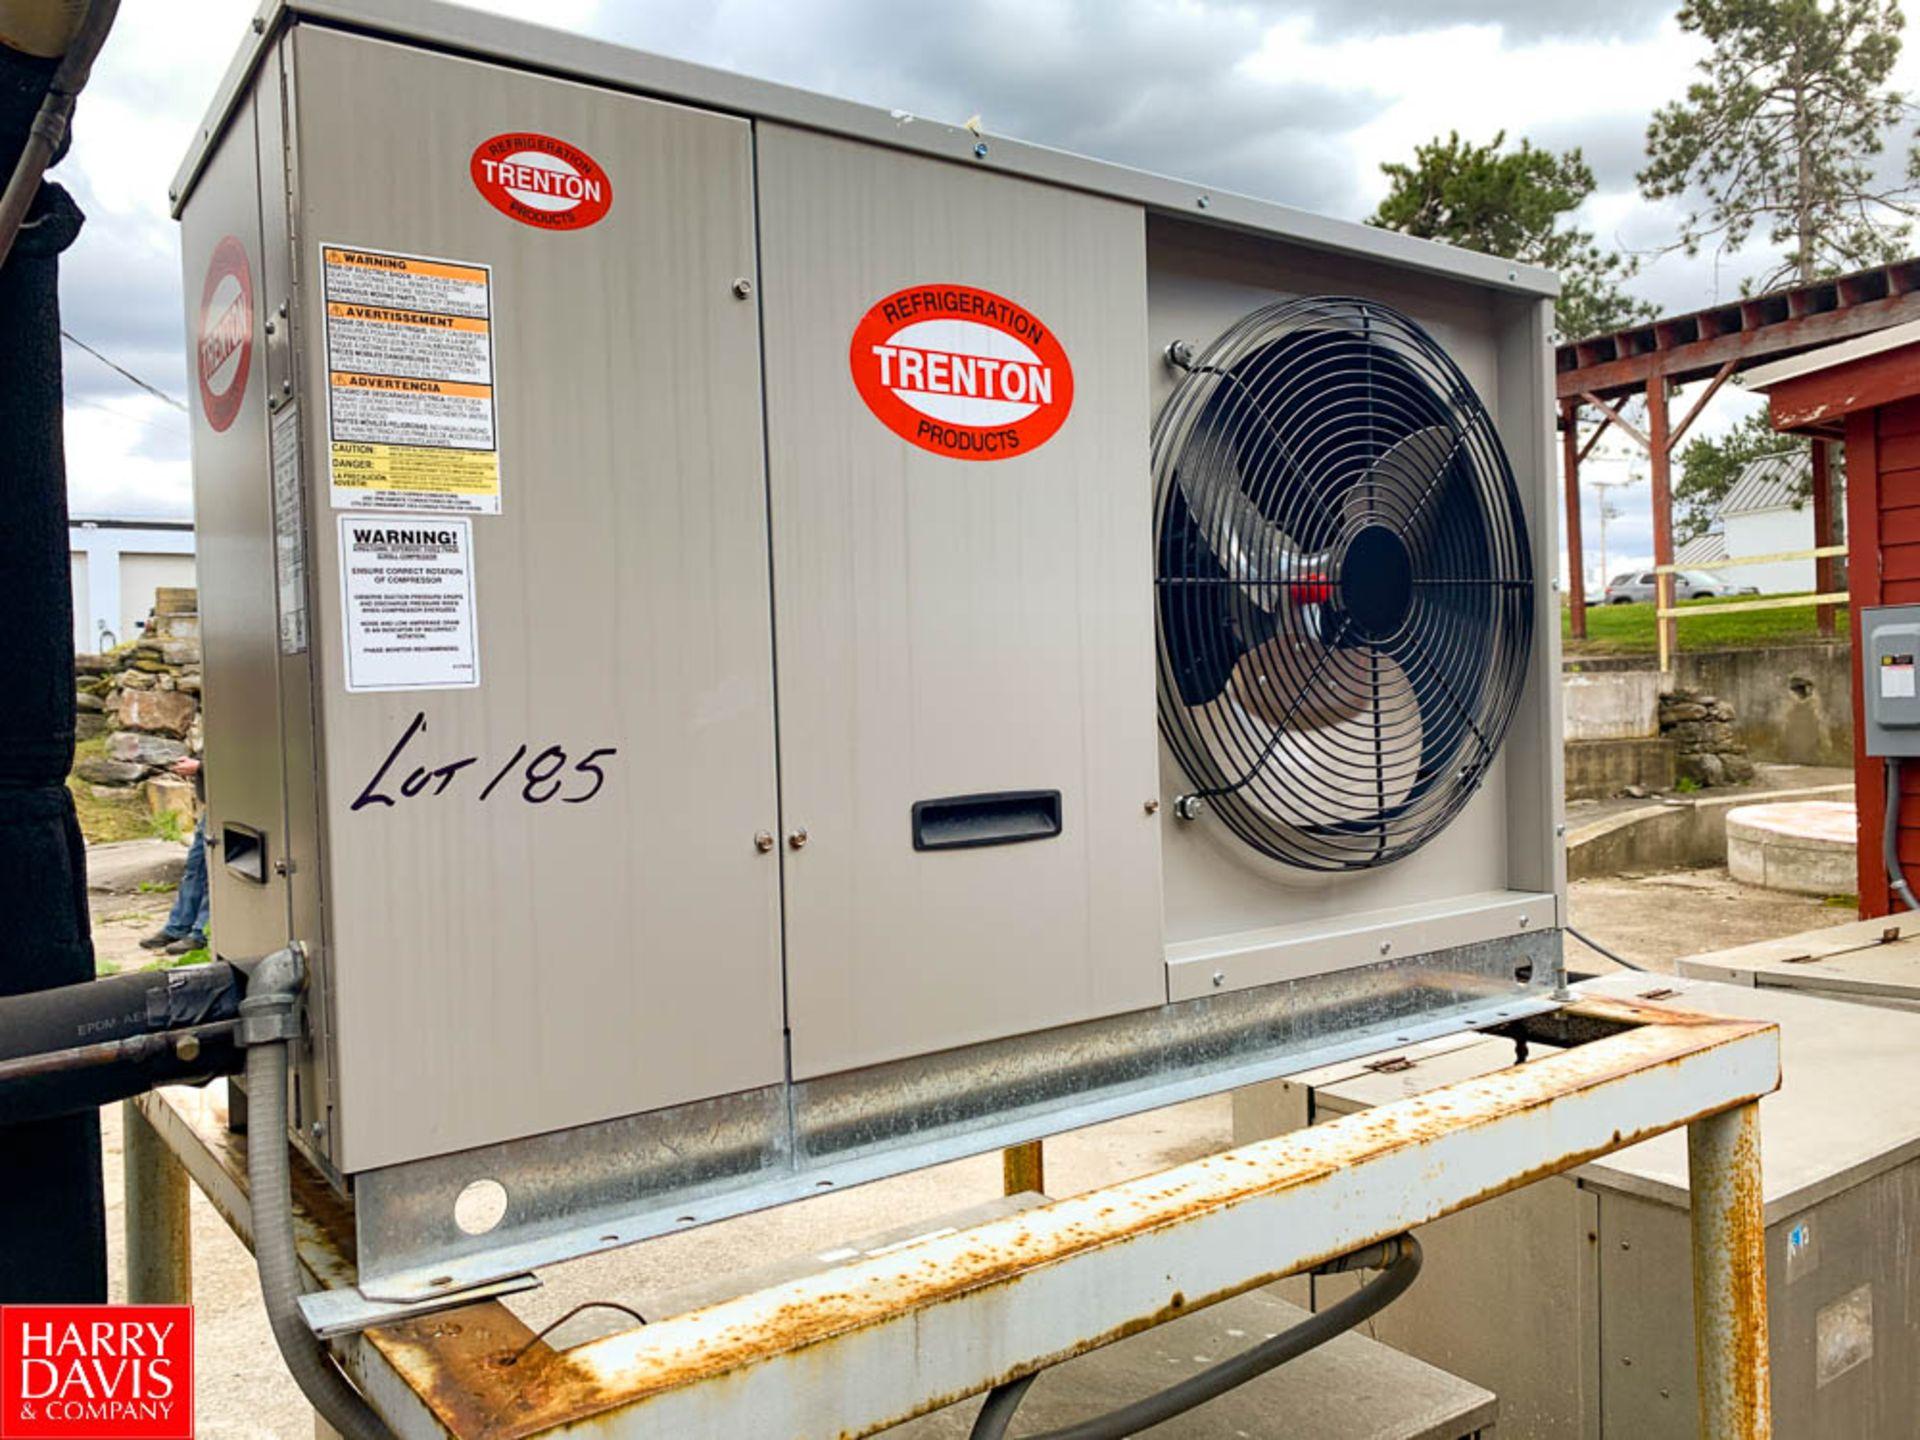 Trenton Condensing Unit Model: TQZA03H8-HT3A-DB, S/N: 182100628, Air Cooled